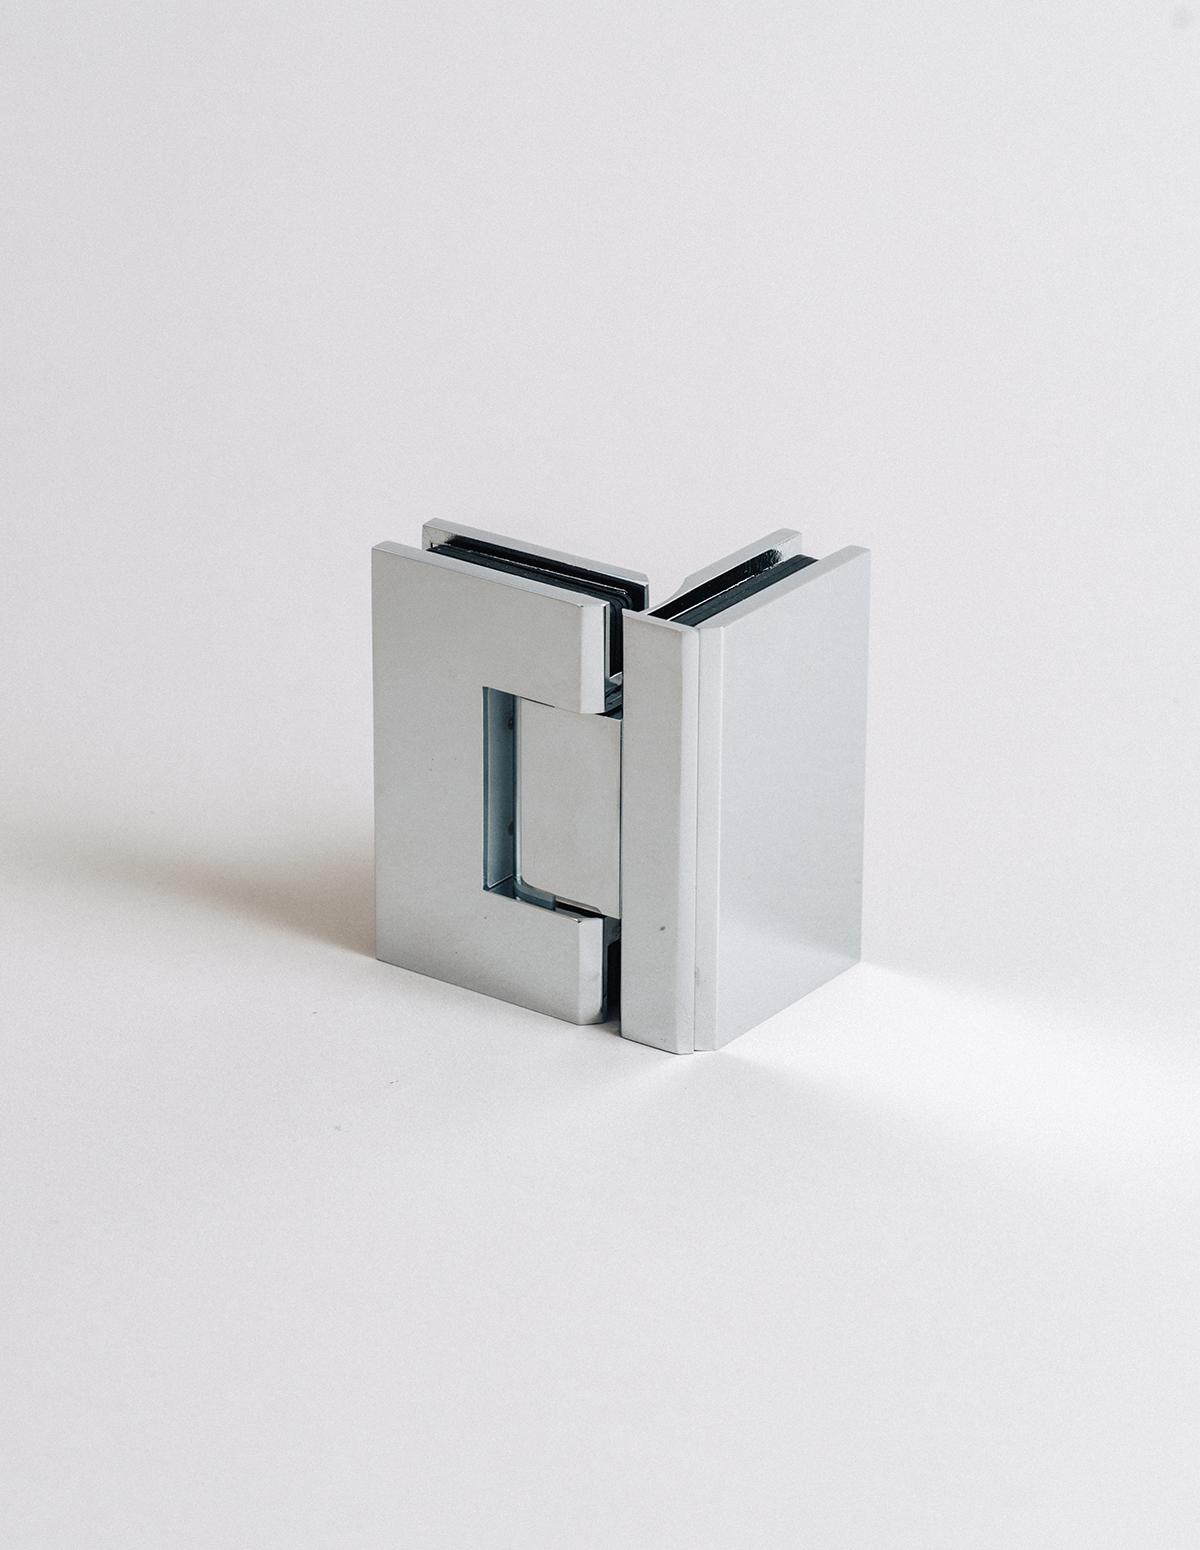 Optimum-Studios-Architectural-Glass-Metal-HardwarePage-Hinge2-042216